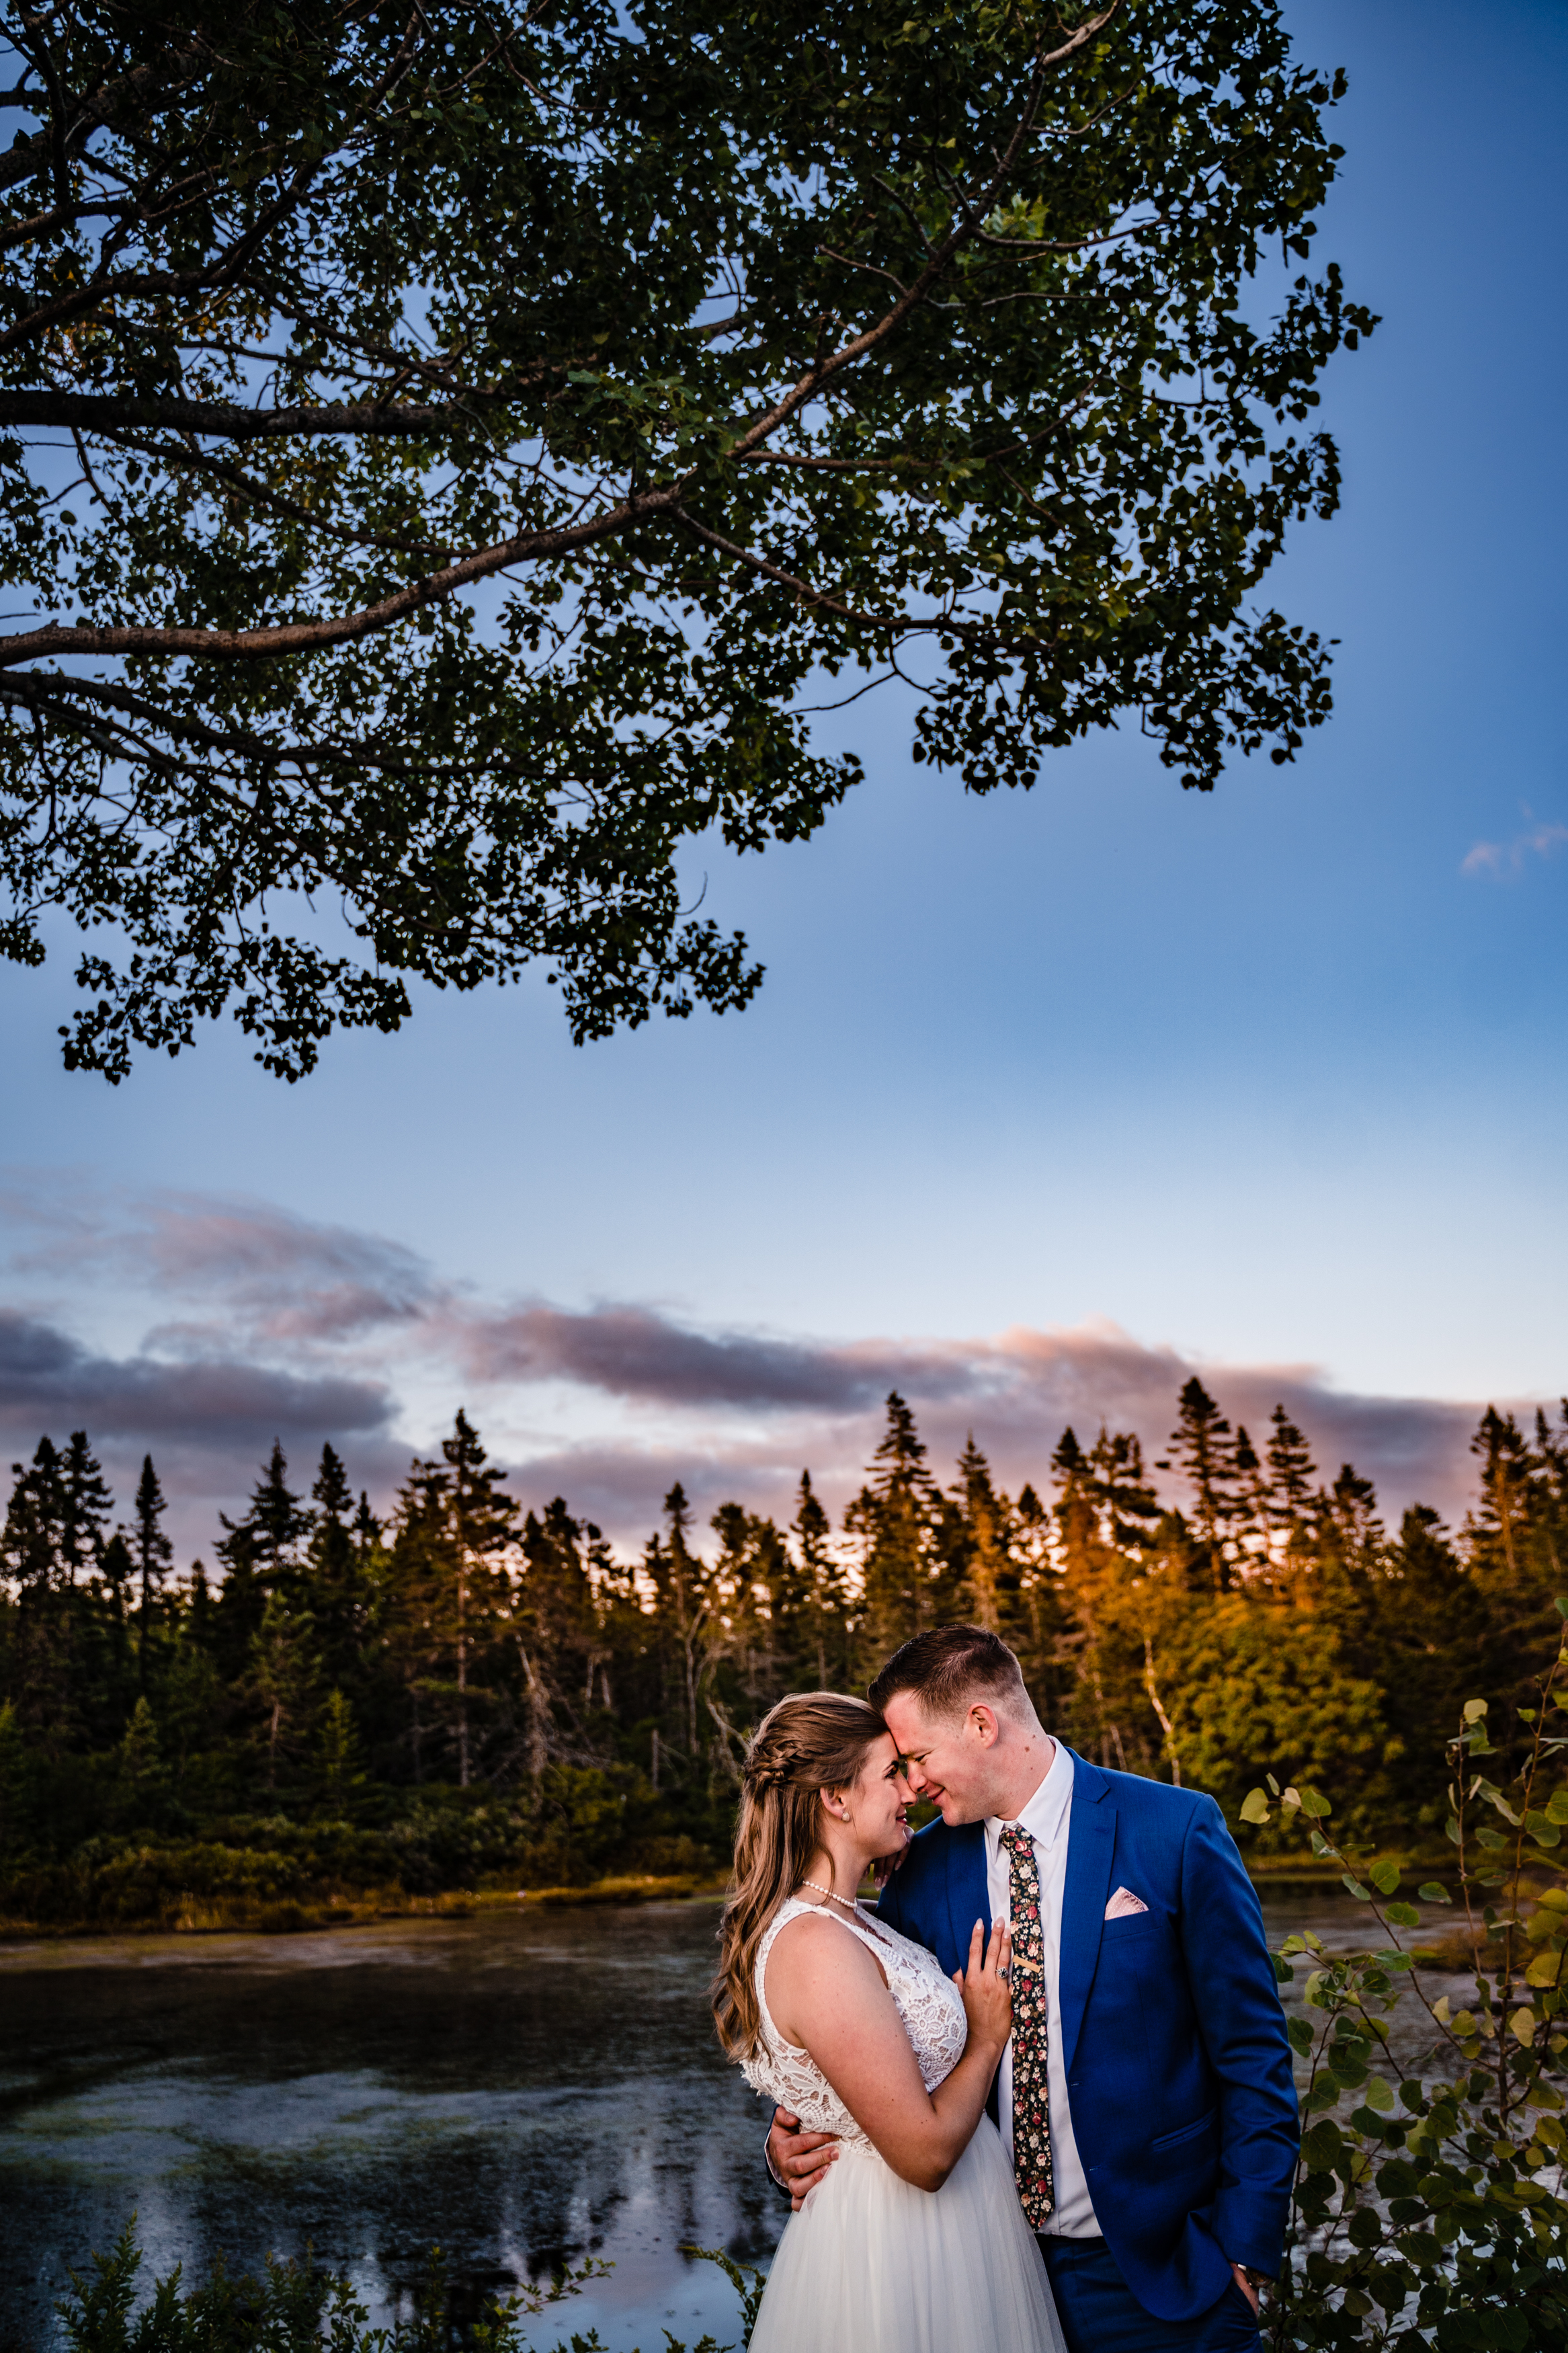 Janelle-Mitch-Halifax-Wedding-Nova-Scotia-Photography (142 of 163).jpg